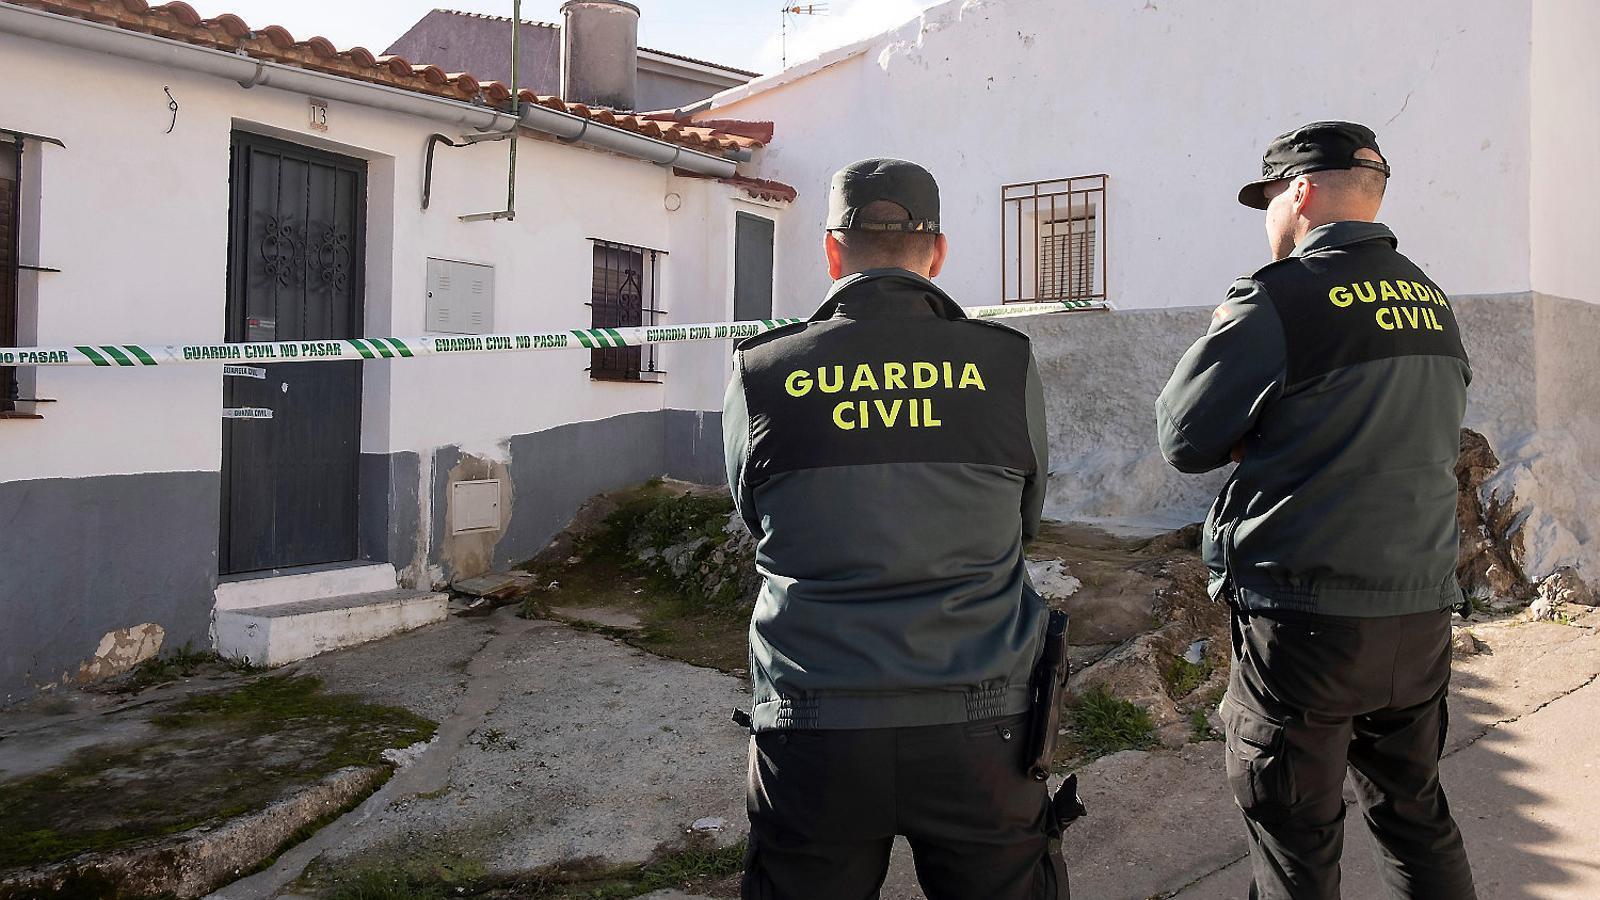 La policia descarta que la desapareguda a Huelva fugís voluntàriament